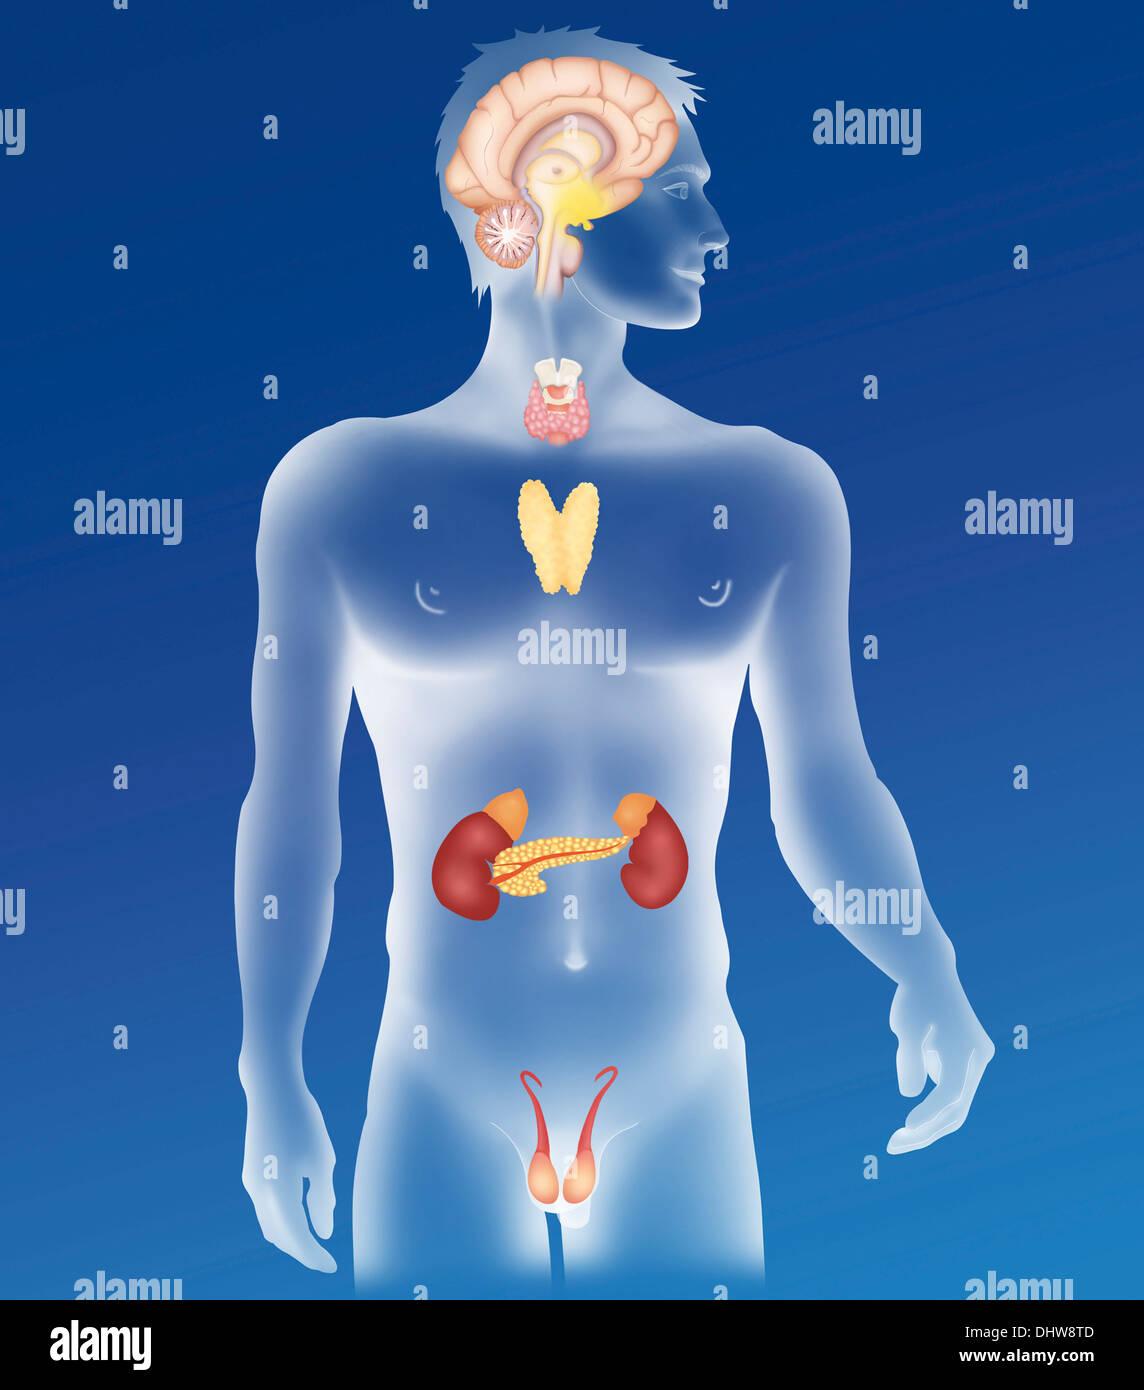 Glándula endocrina, ilustración Imagen De Stock